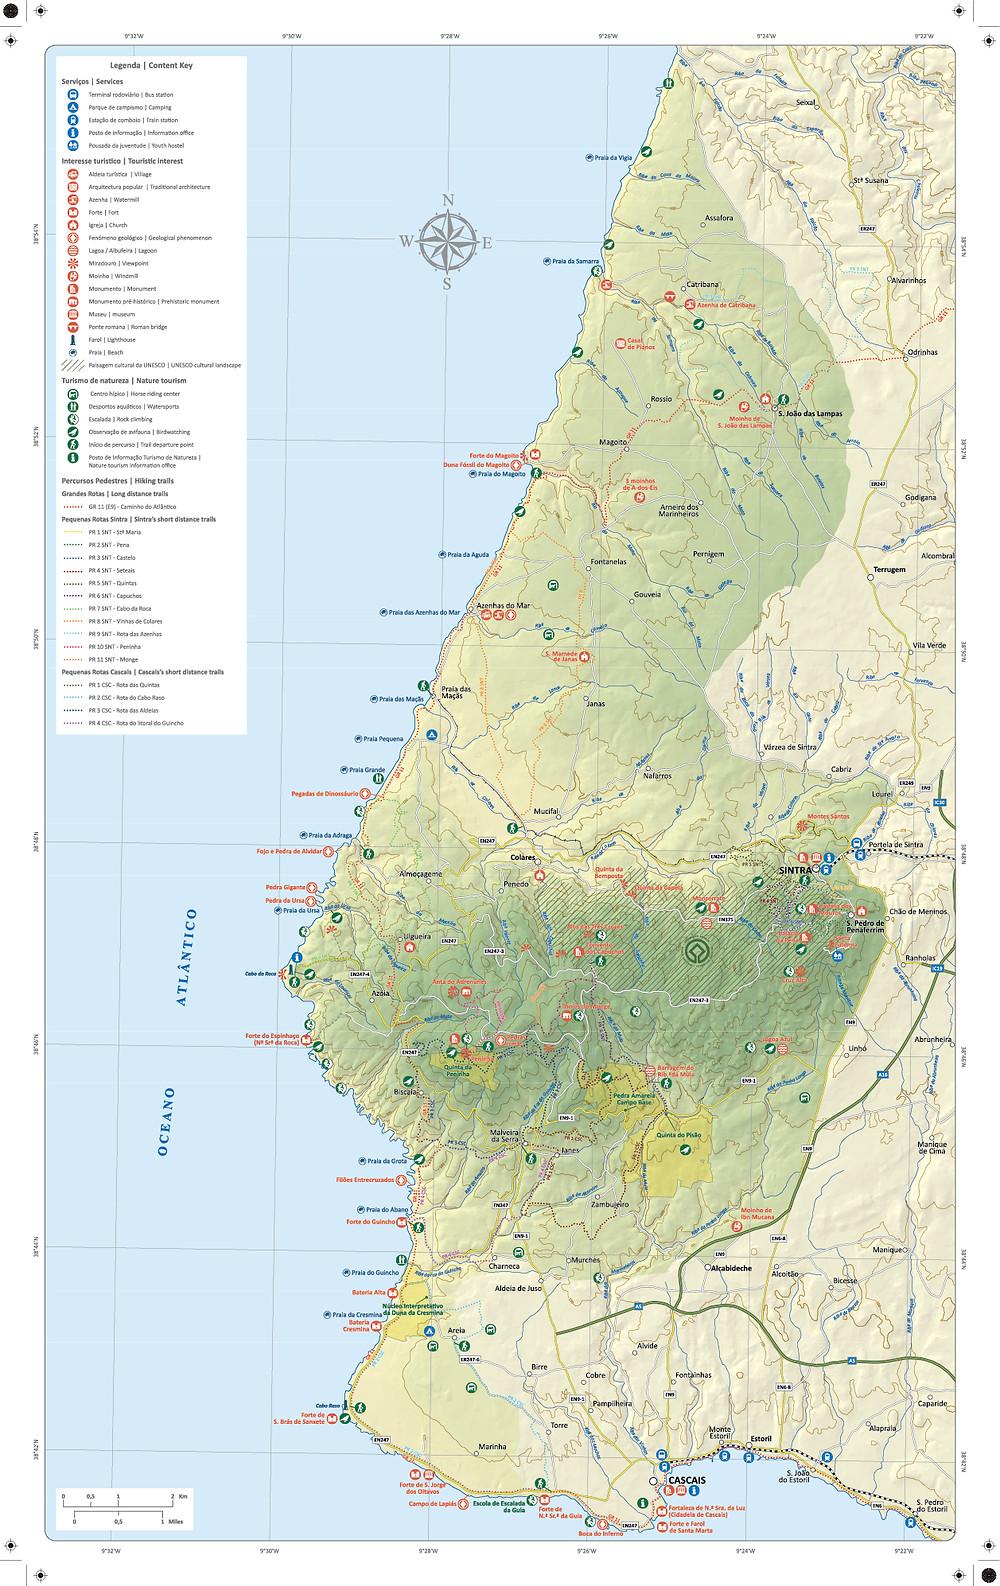 mapa_percursos_pns-c_final_low_res_-_frente-011.jpg